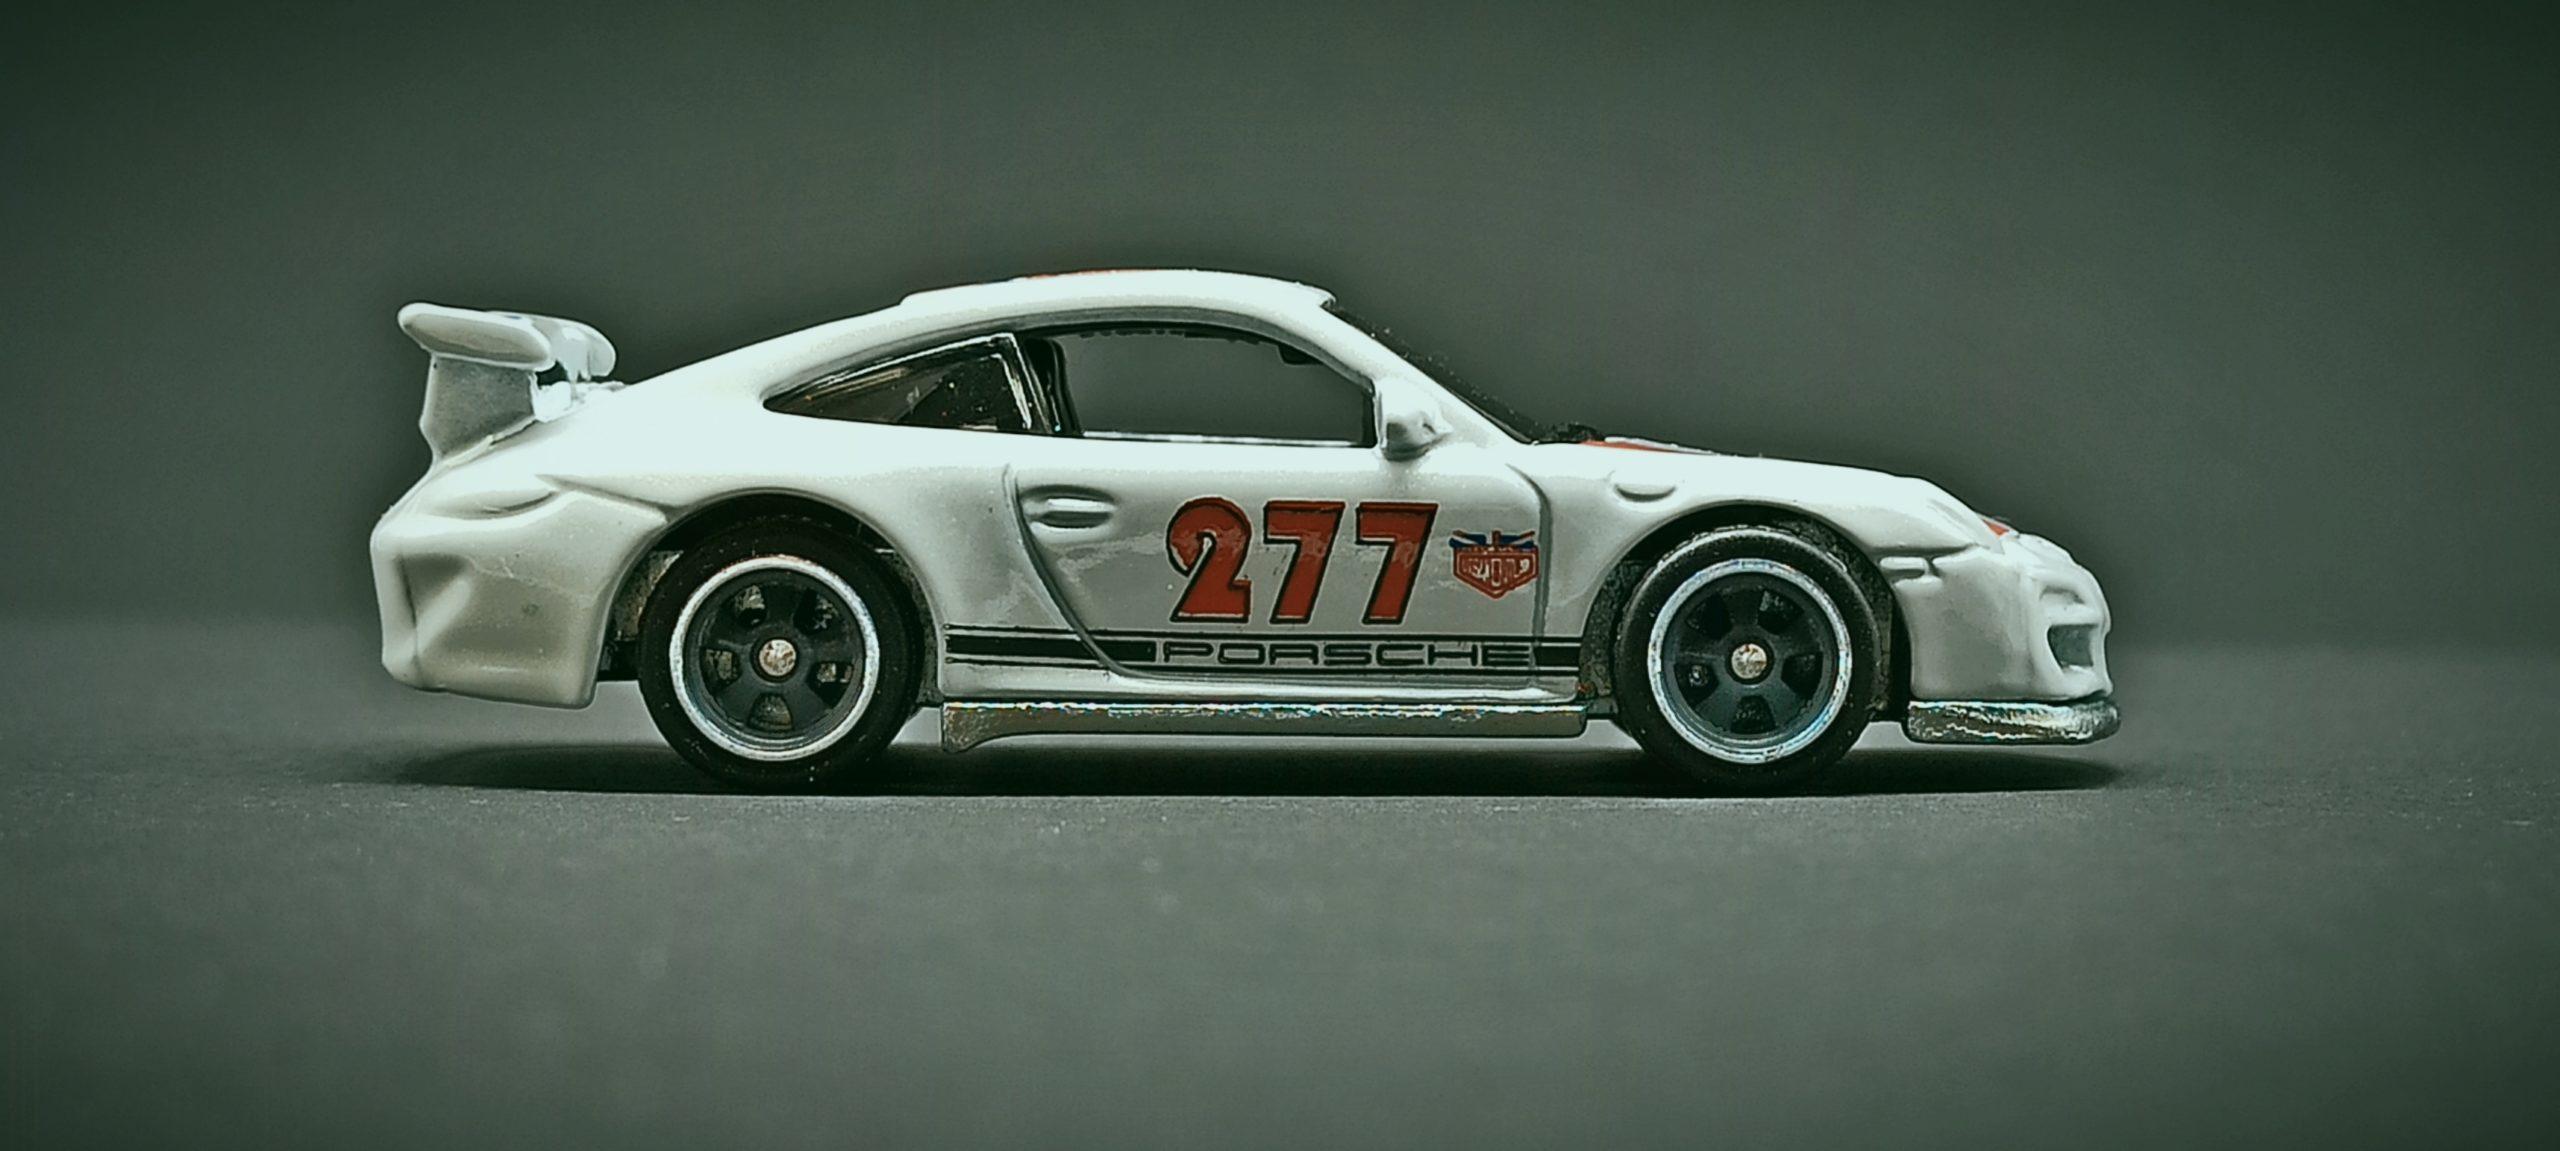 Hot Wheels Porsche 911 GT3 RS (2011 model) (DJF85) 2016 Car Culture: Euro Style (2/5) pearl white Magnus Walker Urban Outlaw side